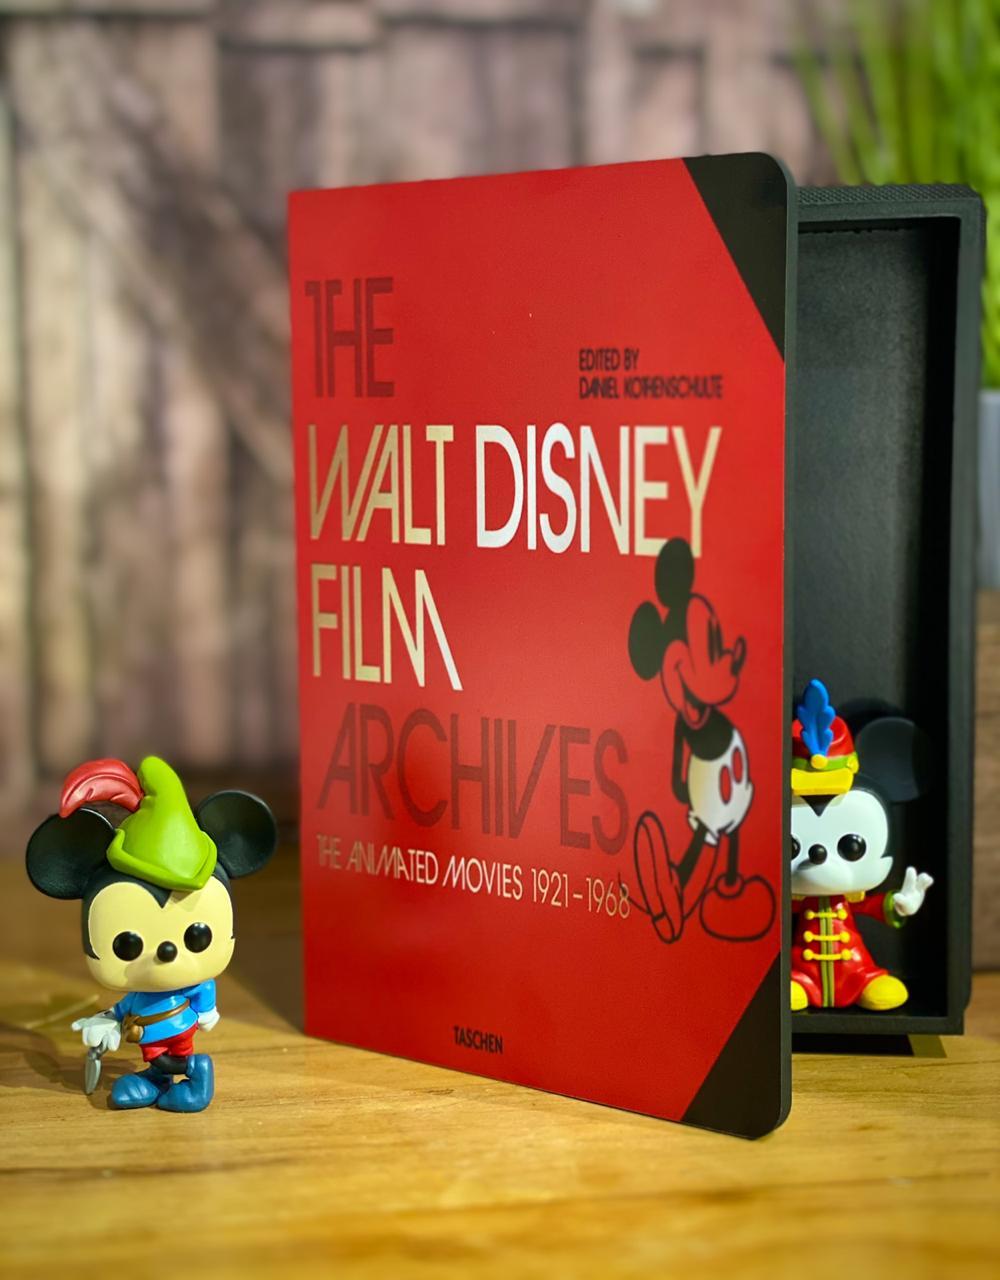 Caixa Livro The Walt Disney Film Archves: ''The Animeted Moveis 1921-1968'' - Disney